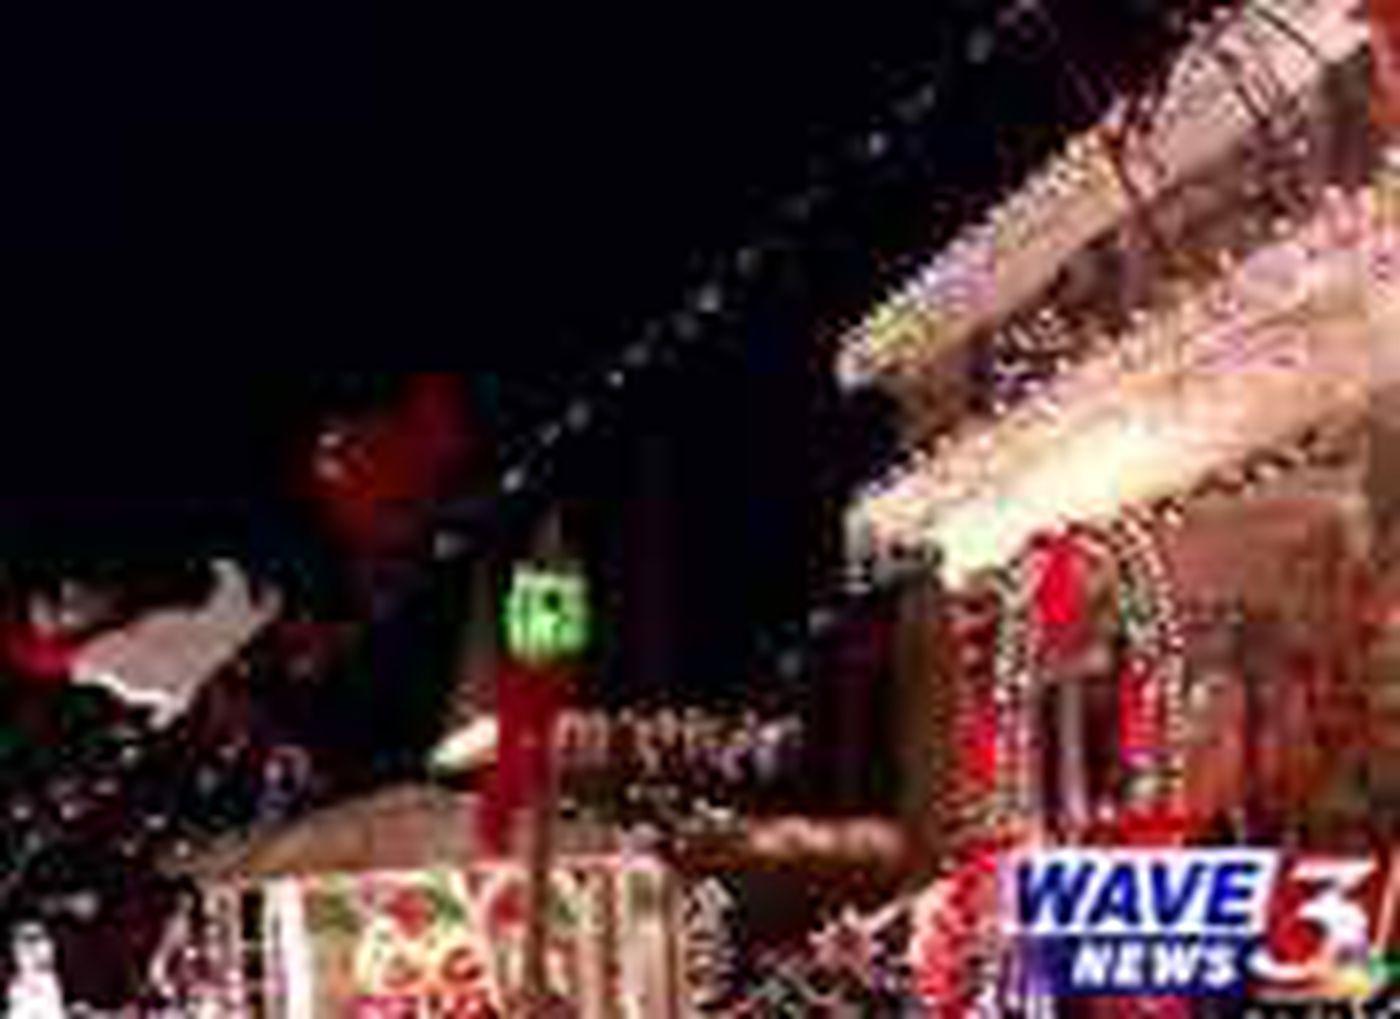 Residents Say Neighbor's Christmas Display Causing